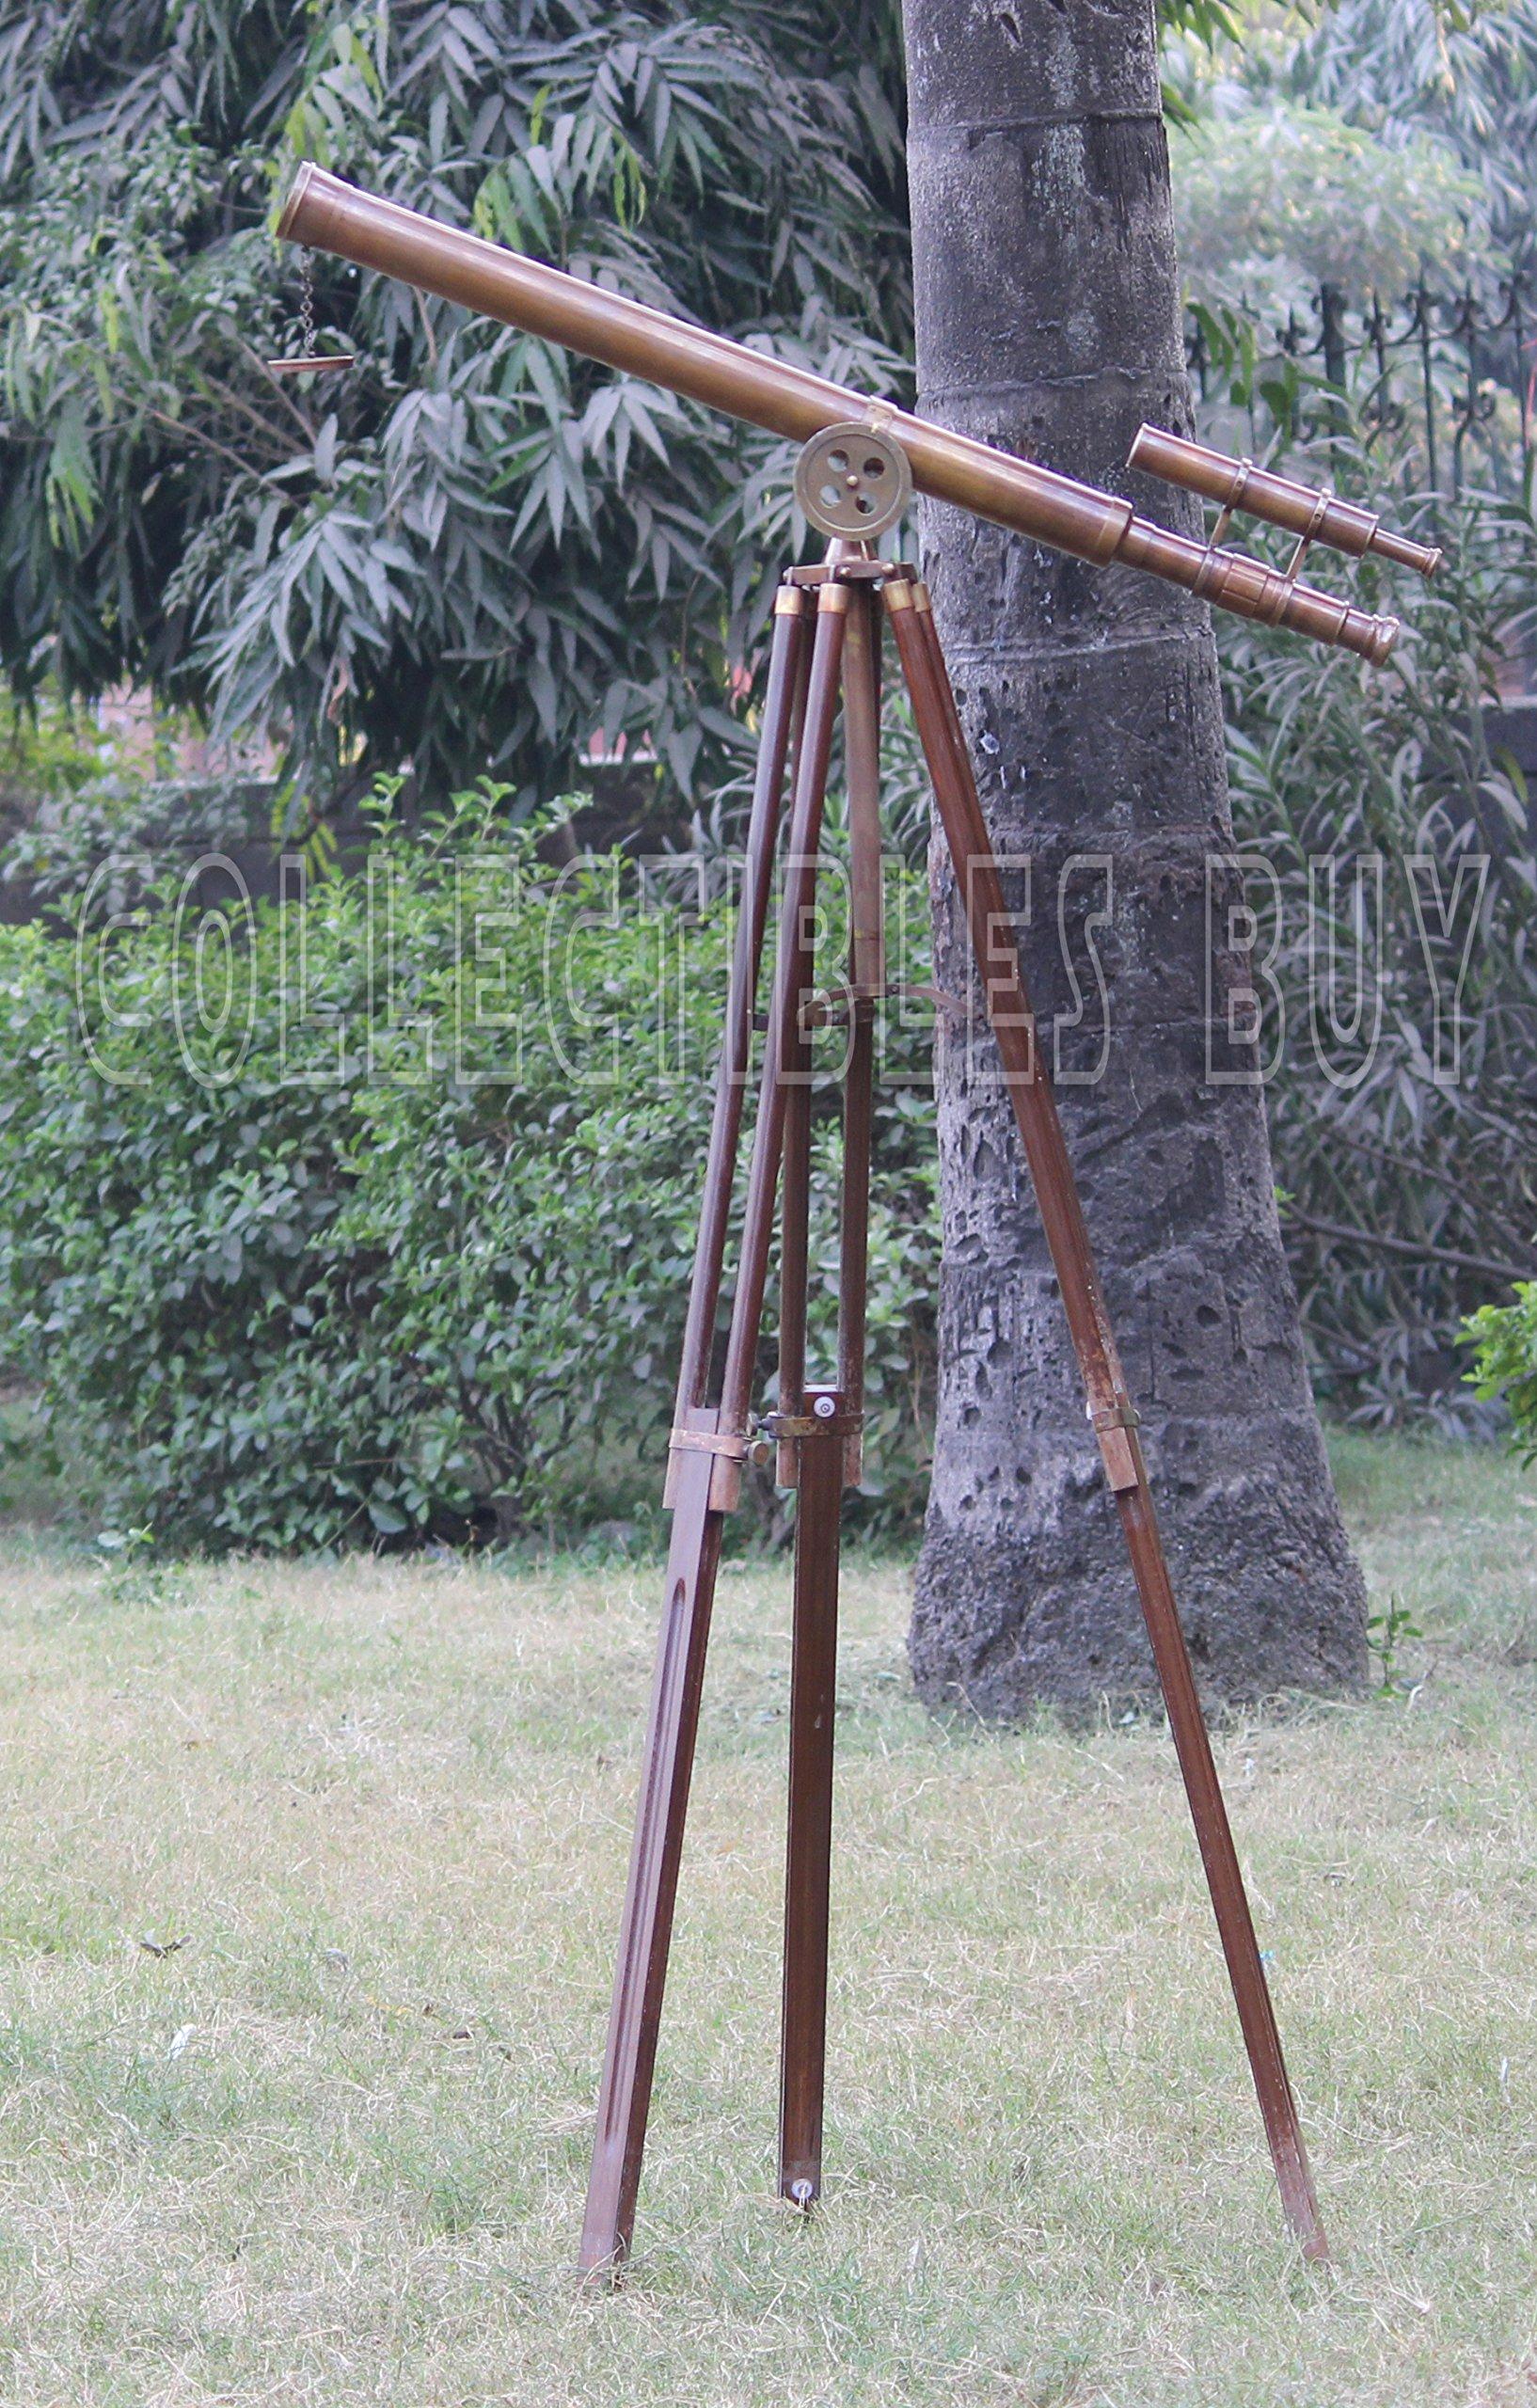 Collectibles Buy U.S. Navy Griffith Antique Tripod Telescope Double Barrel Nautical Decorative (Double Barrel Tube (Height:65 Inches)) by Collectibles Buy